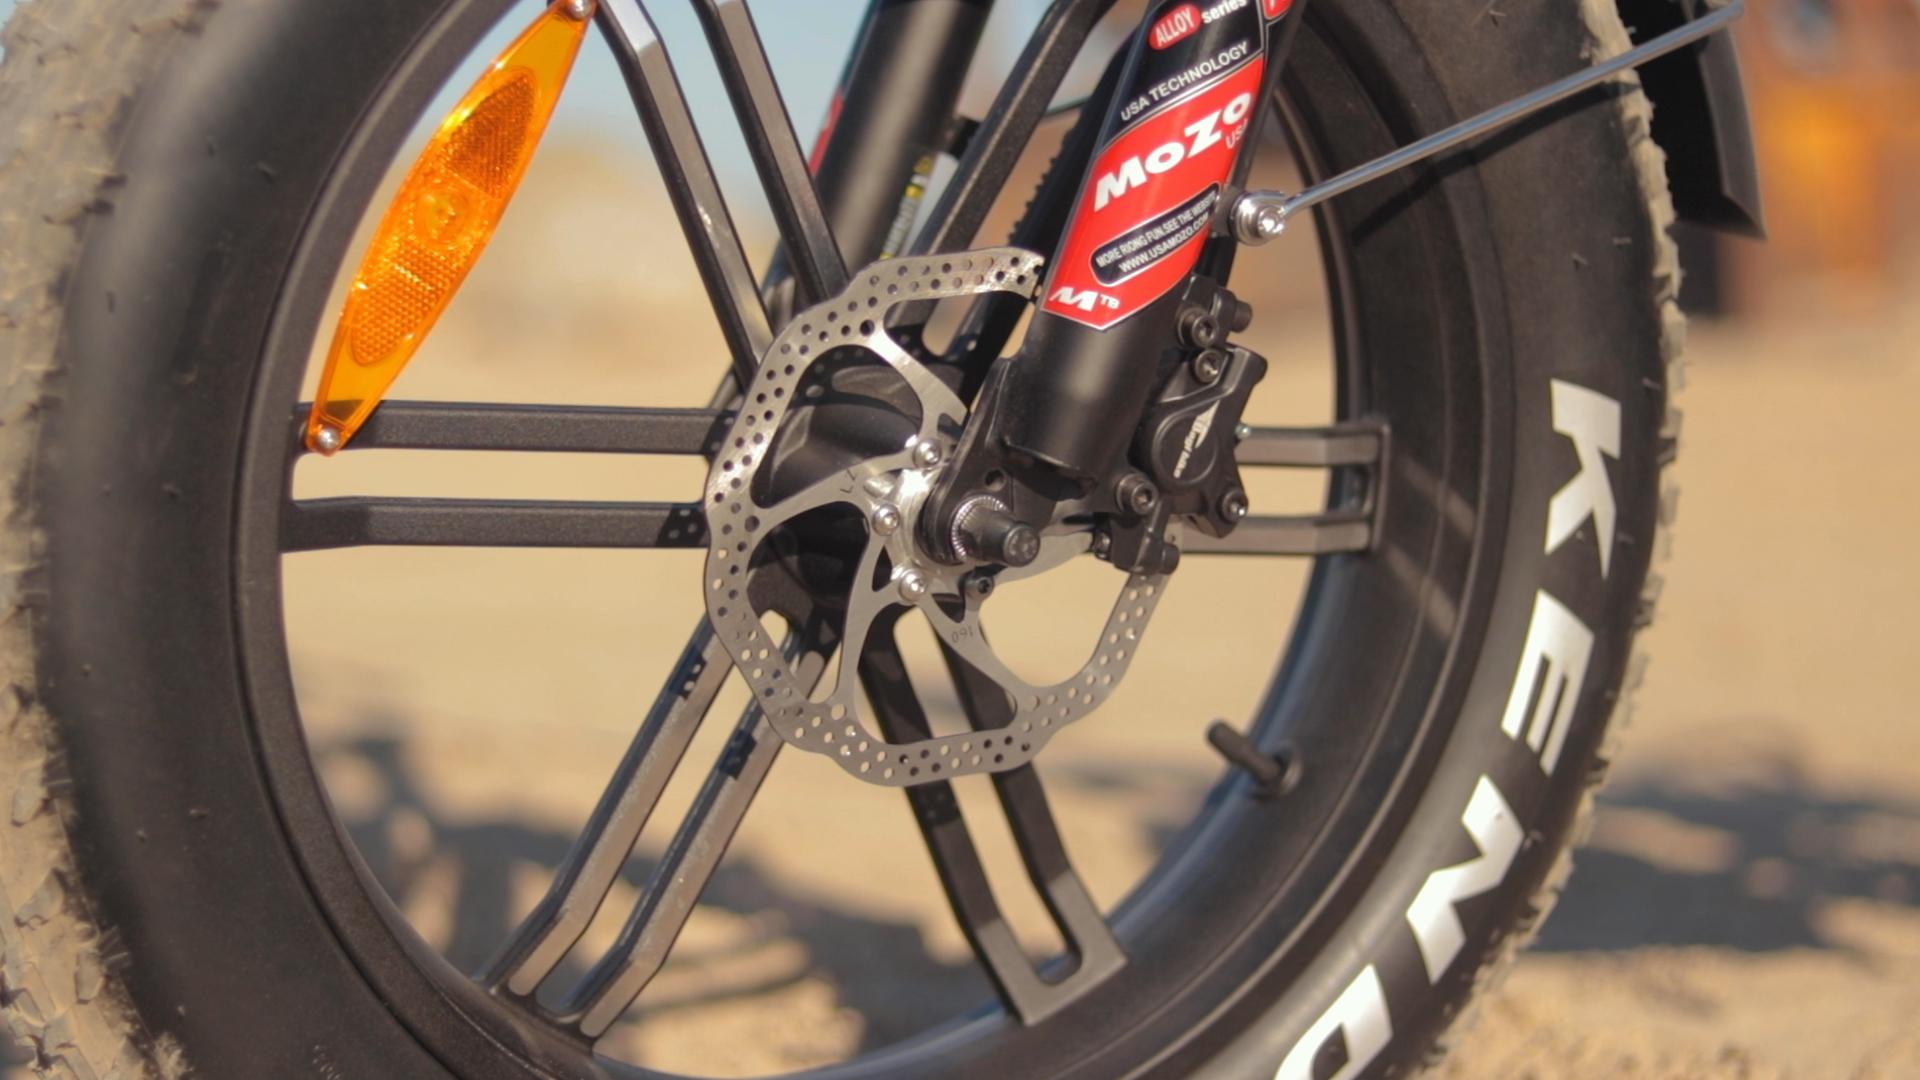 electrified-reviews-bagibike-b20-premium-electric-bike-review-tektro-hydraulic-disc-brake.jpg